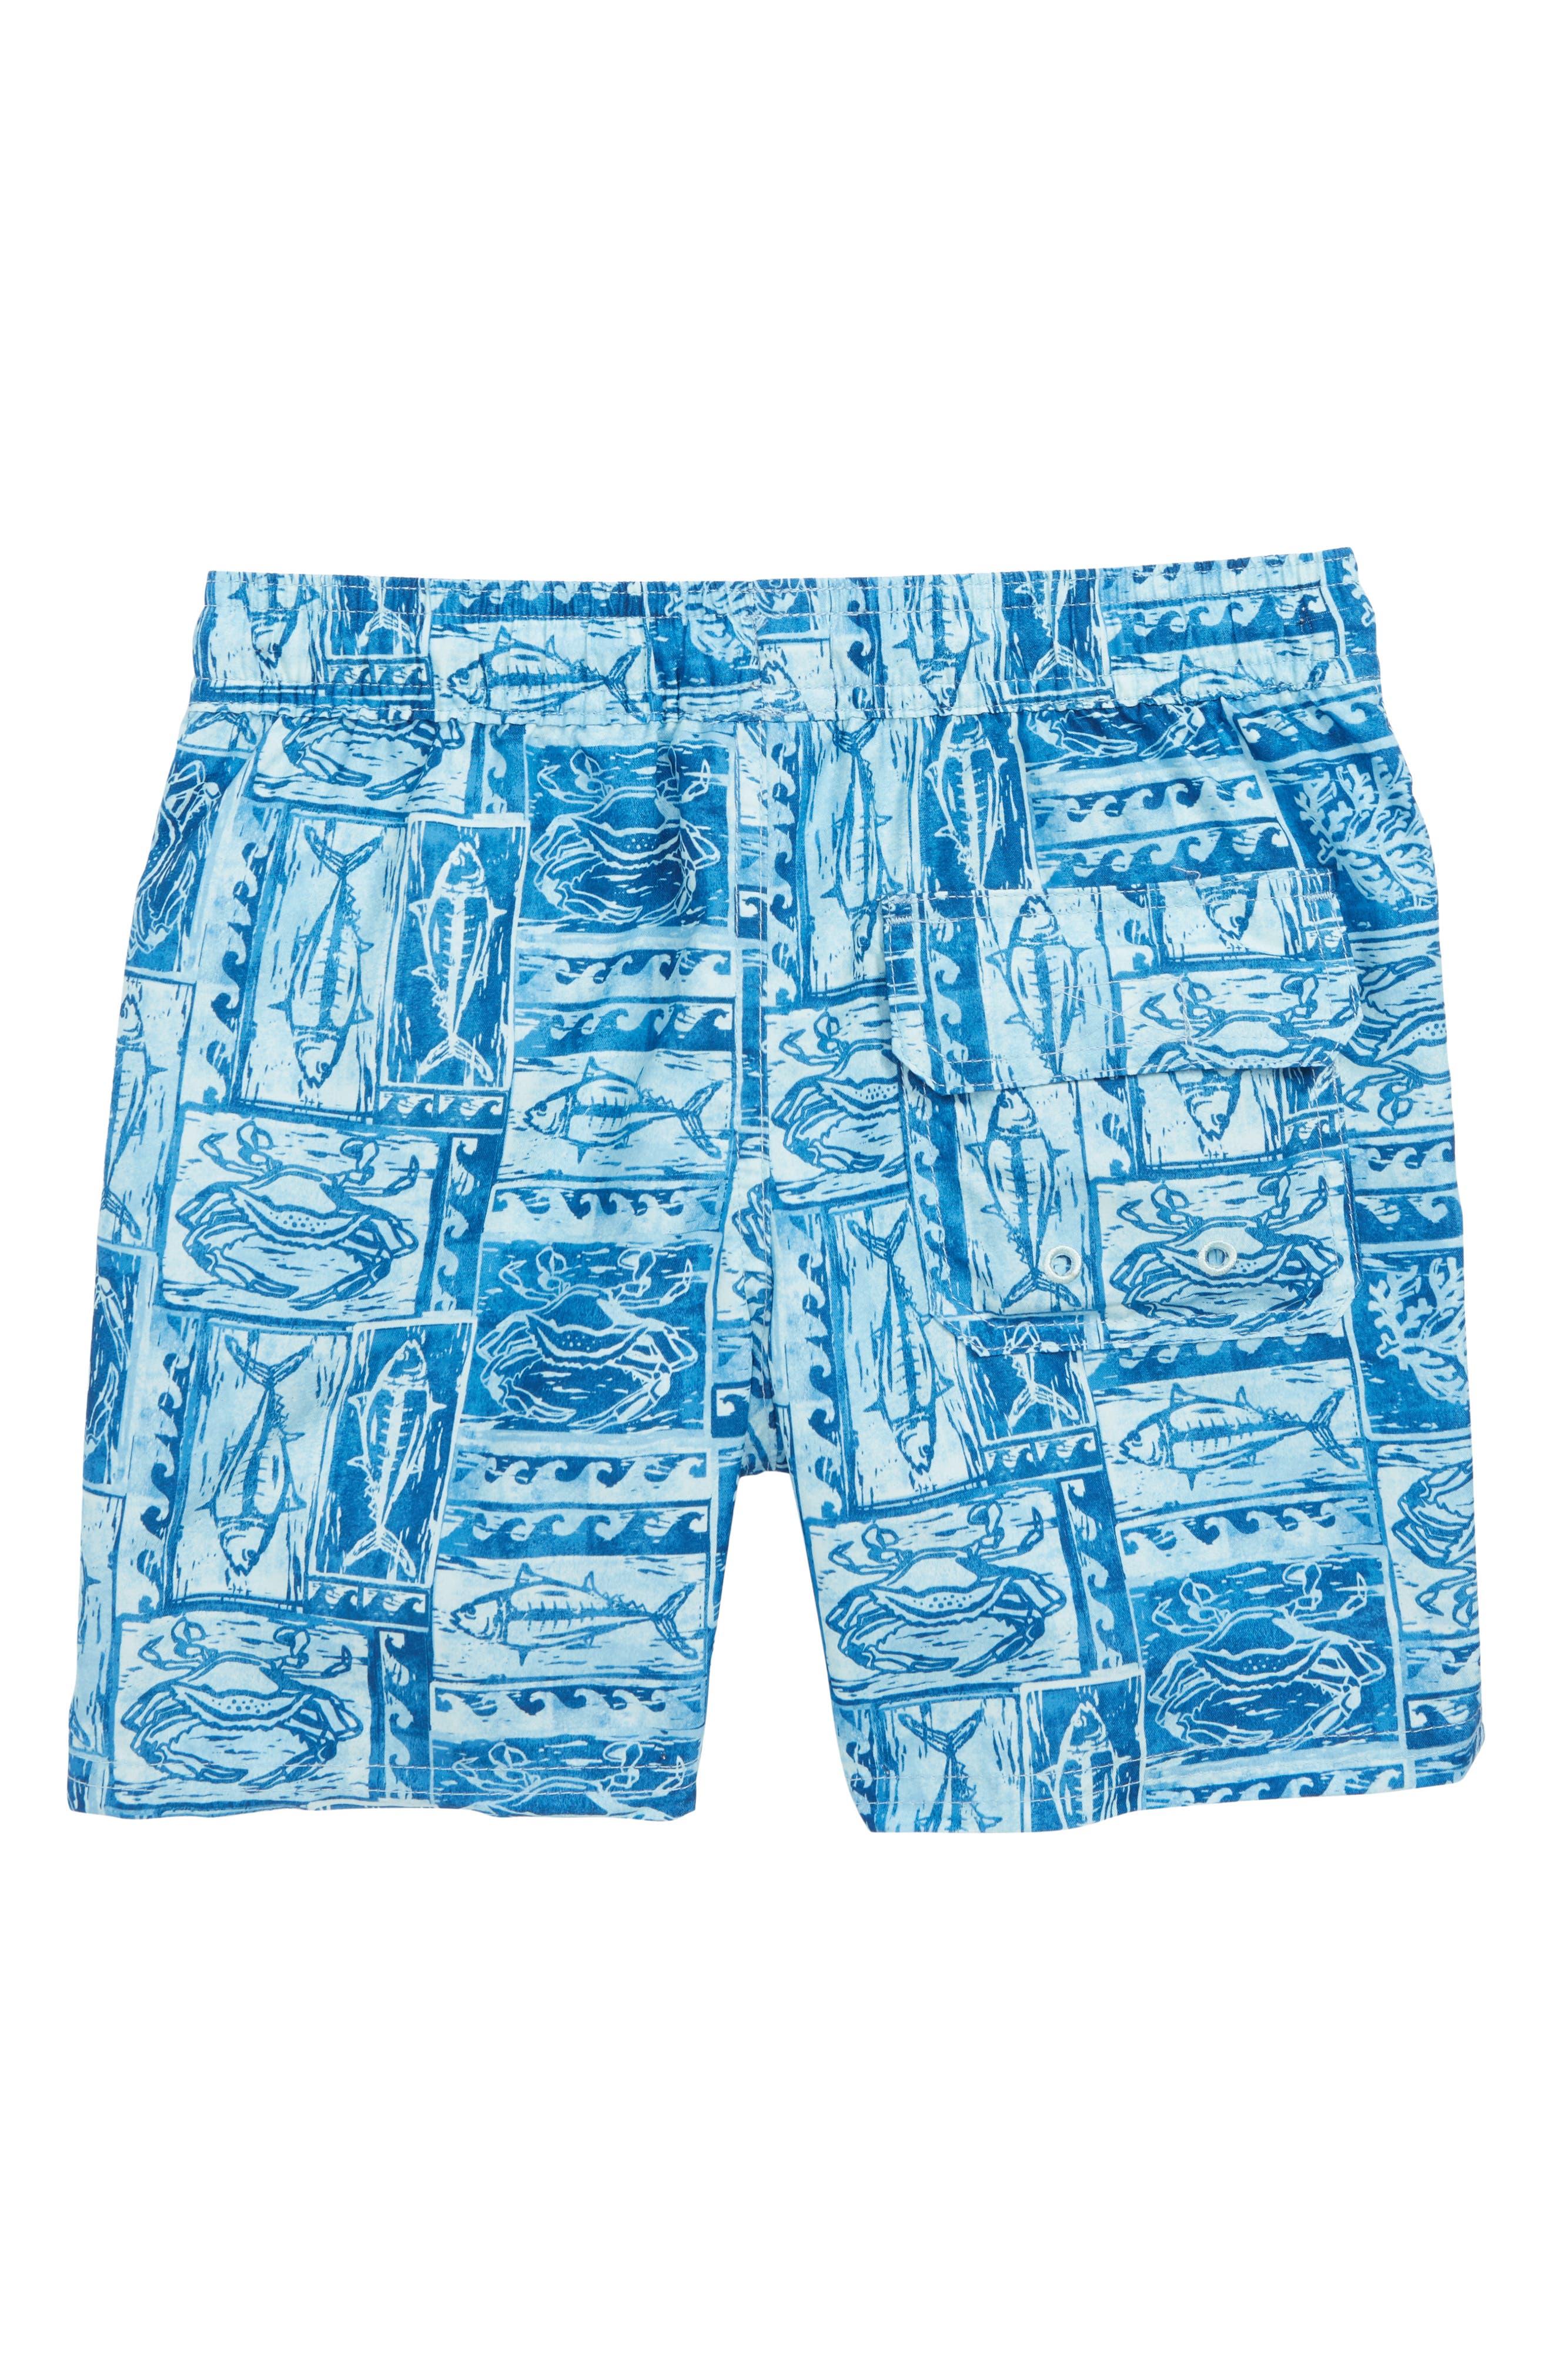 Woodblock Sea Life Chappy Swim Trunks,                             Alternate thumbnail 2, color,                             JAKE BLUE